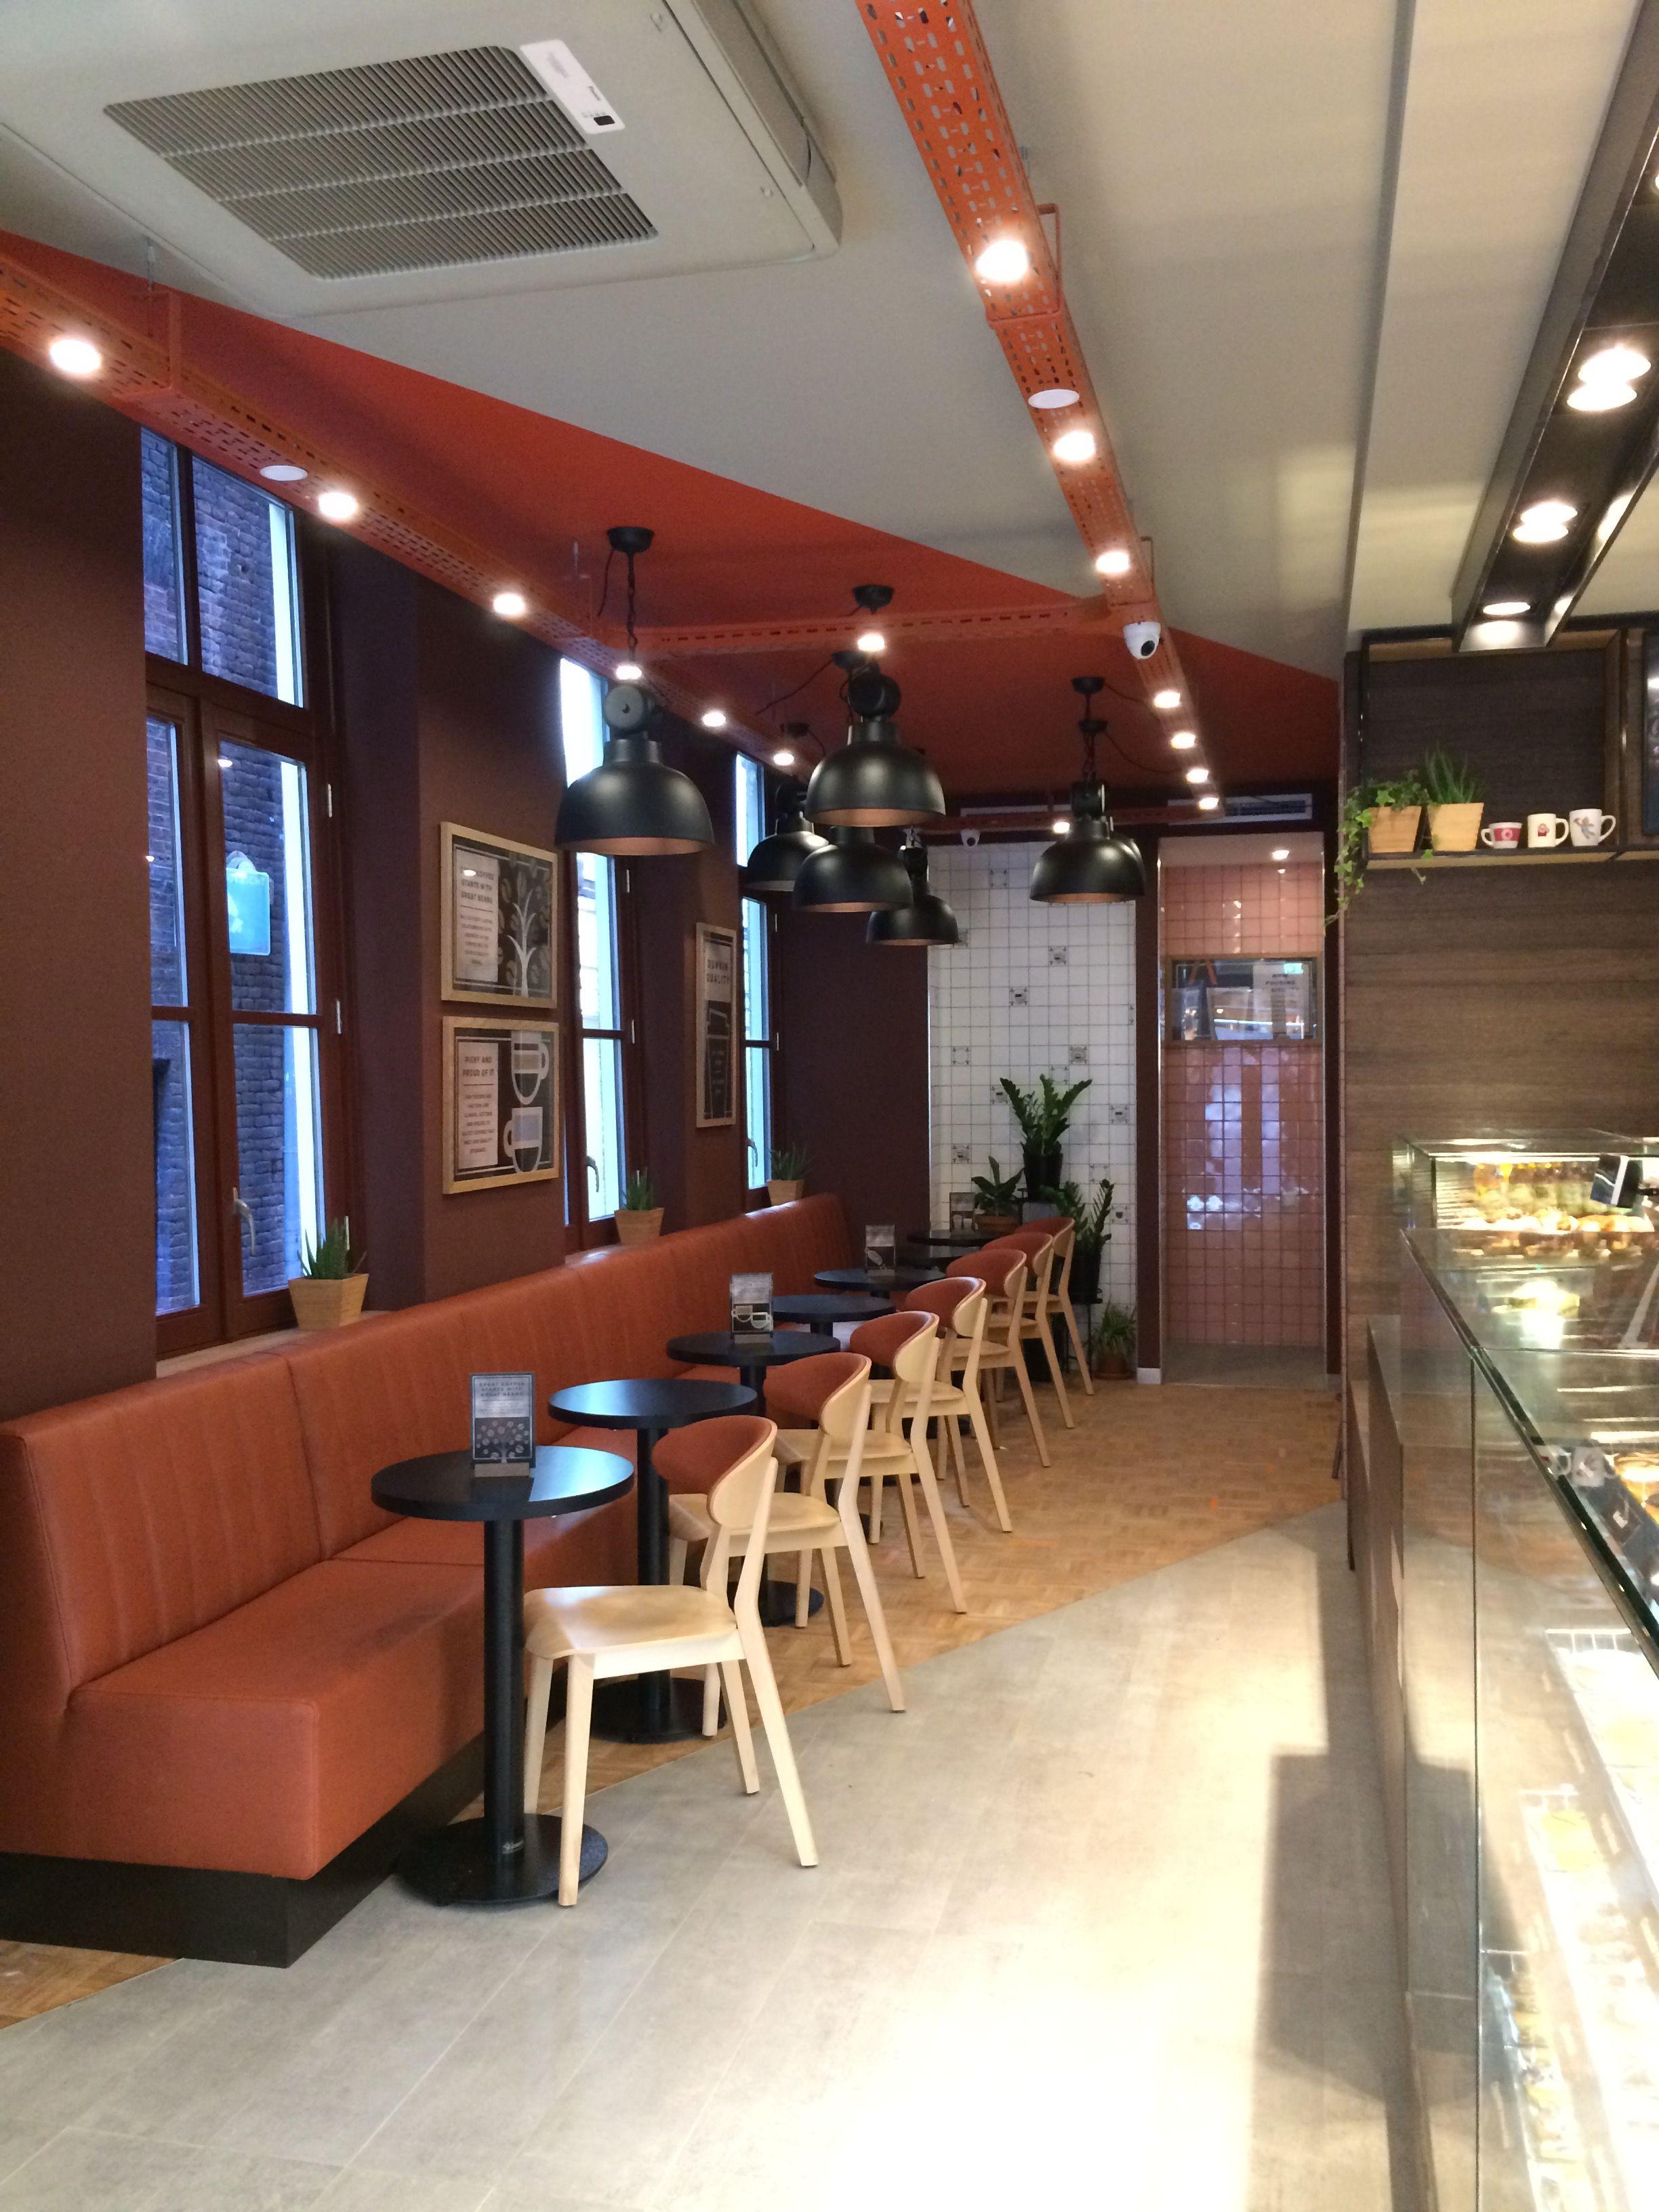 Dunkin Donuts amsterdam | inspiring cafes | Pinterest | Dunkin donuts